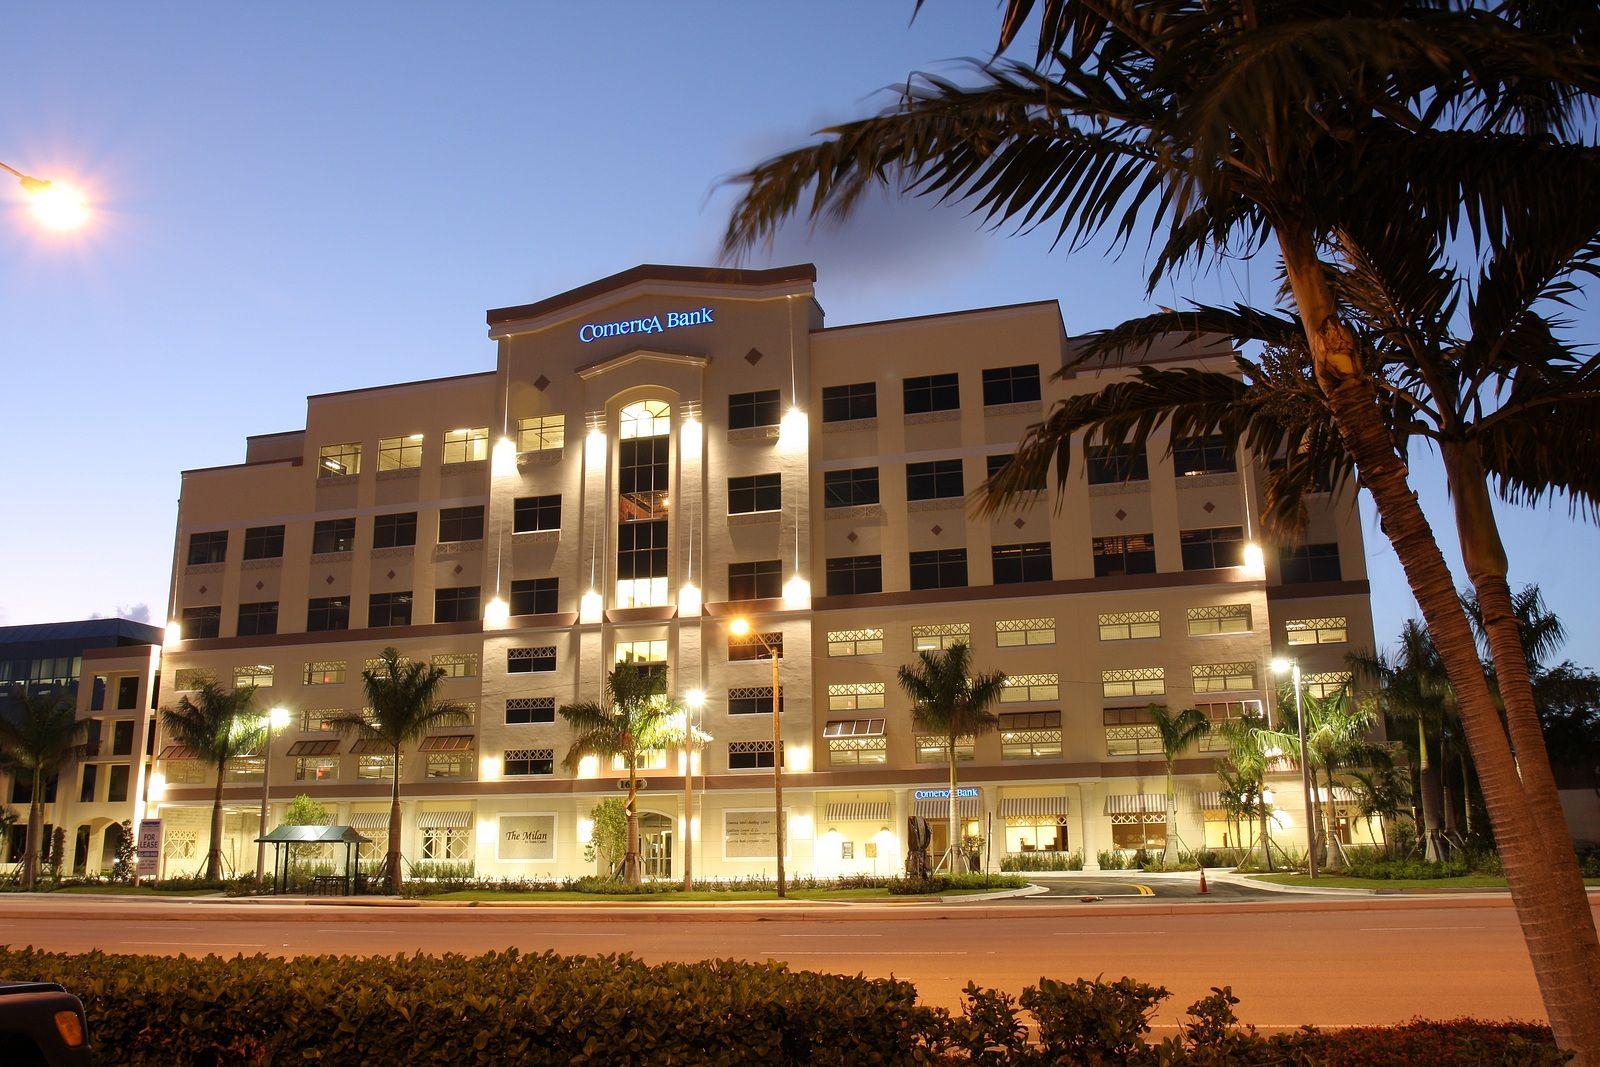 Boca raton office south florida real estate